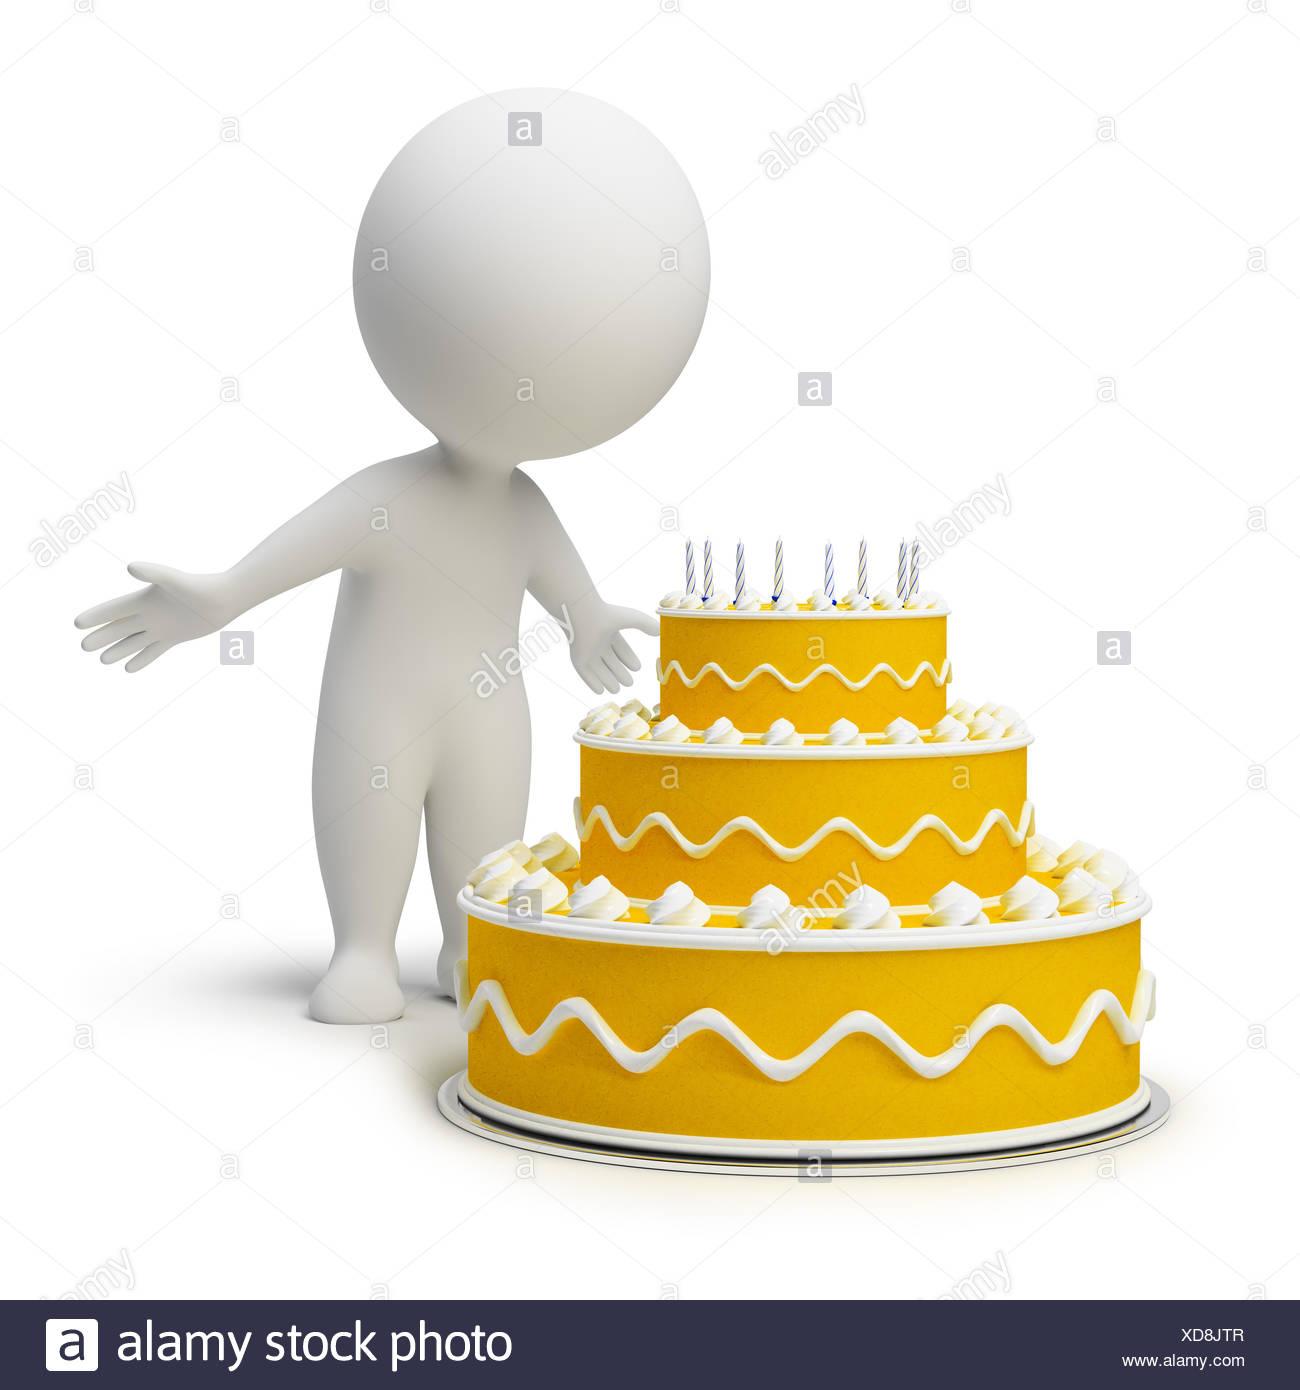 Surprising 3D Small People Birthday Cake Stock Photo 283546839 Alamy Personalised Birthday Cards Paralily Jamesorg